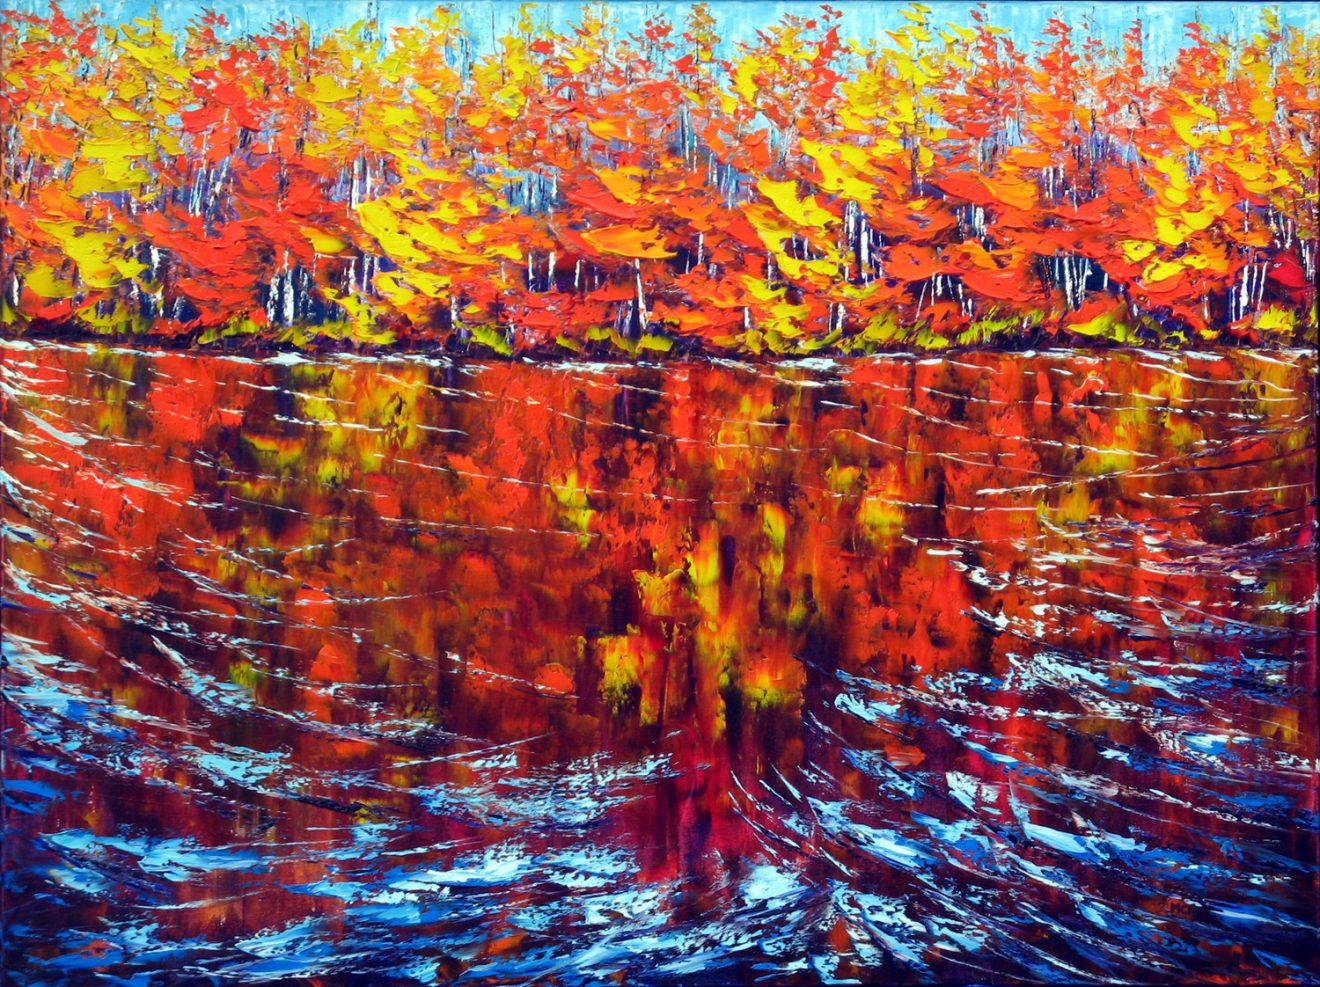 Margaret Chwialkowska-Persimmon Reflection, Ottawa River.